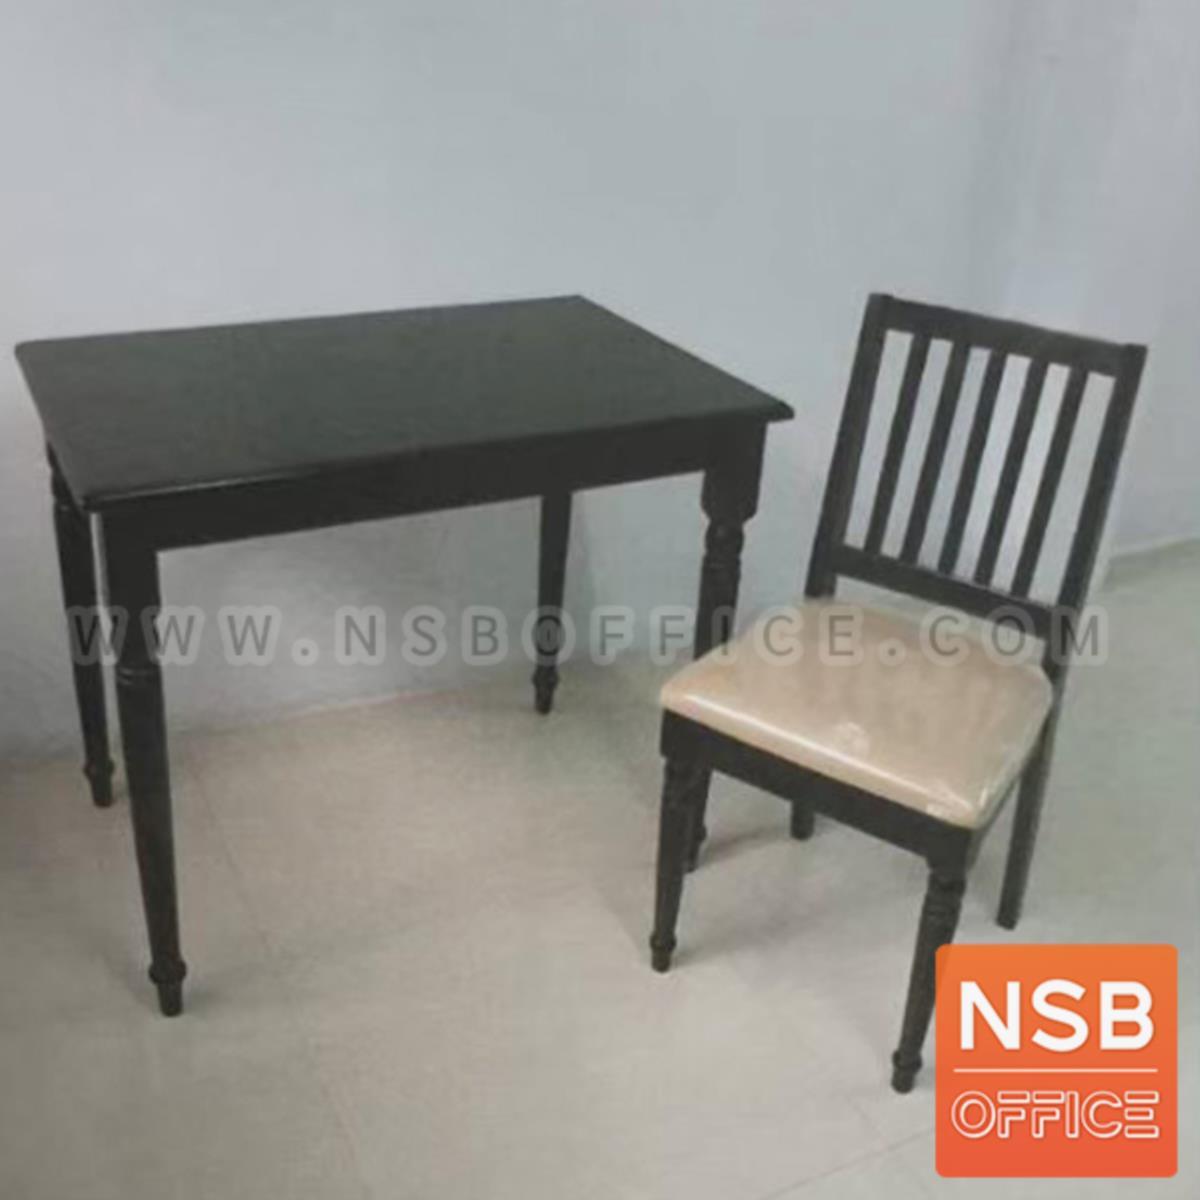 G20A004:ชุดโต๊ะรับประทานอาหารไม้ยางพารา รุ่น Bruce  (บรูซ) ขนาด 90W,120W cm. ขากลึง